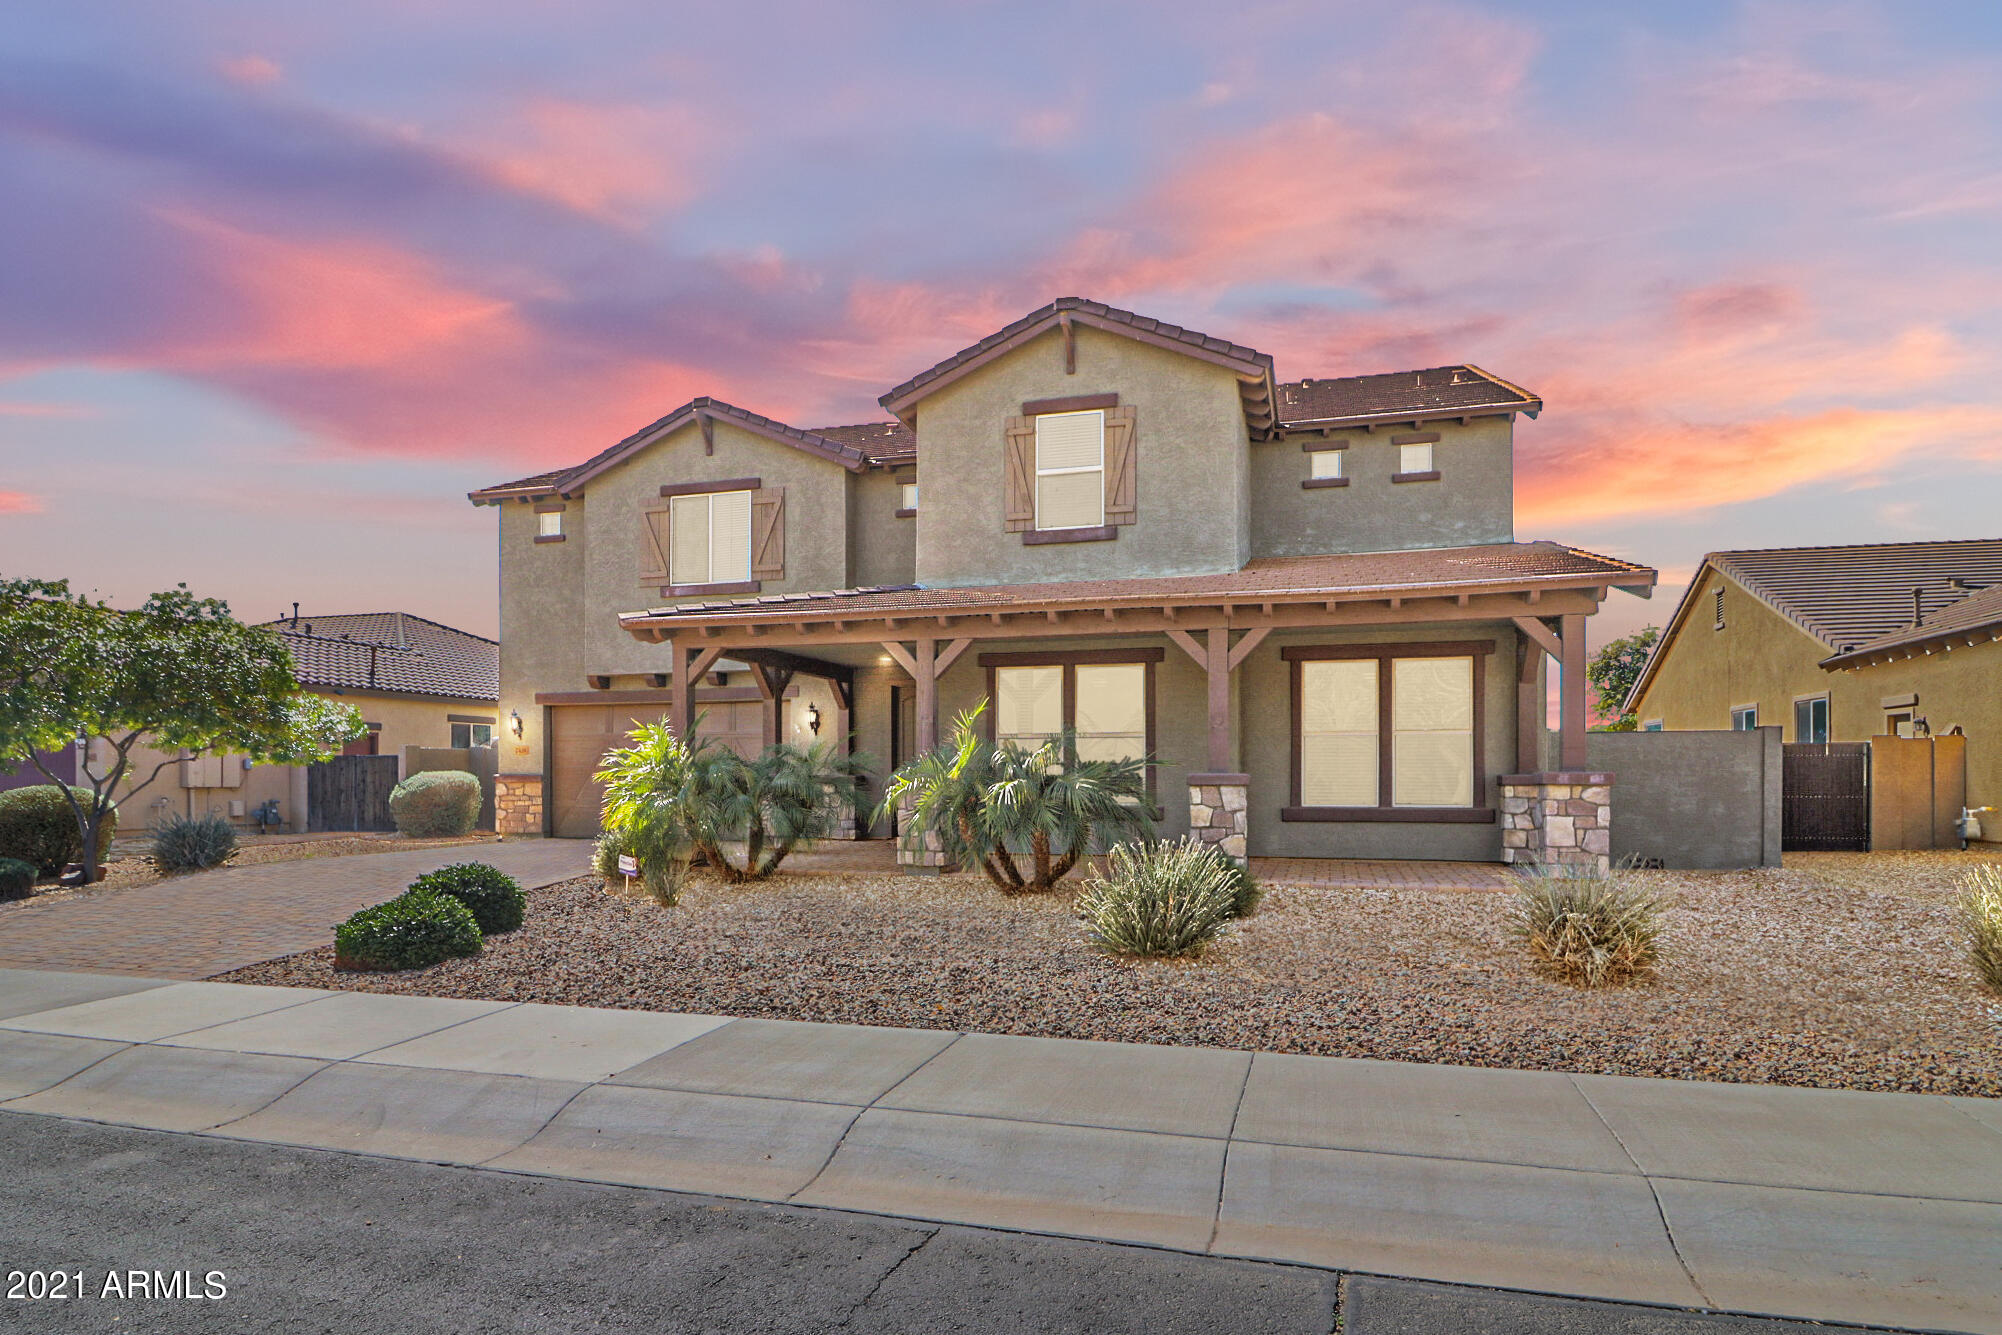 MLS 6215819 2426 N 161ST Avenue, Goodyear, AZ 85395 Goodyear AZ Gated